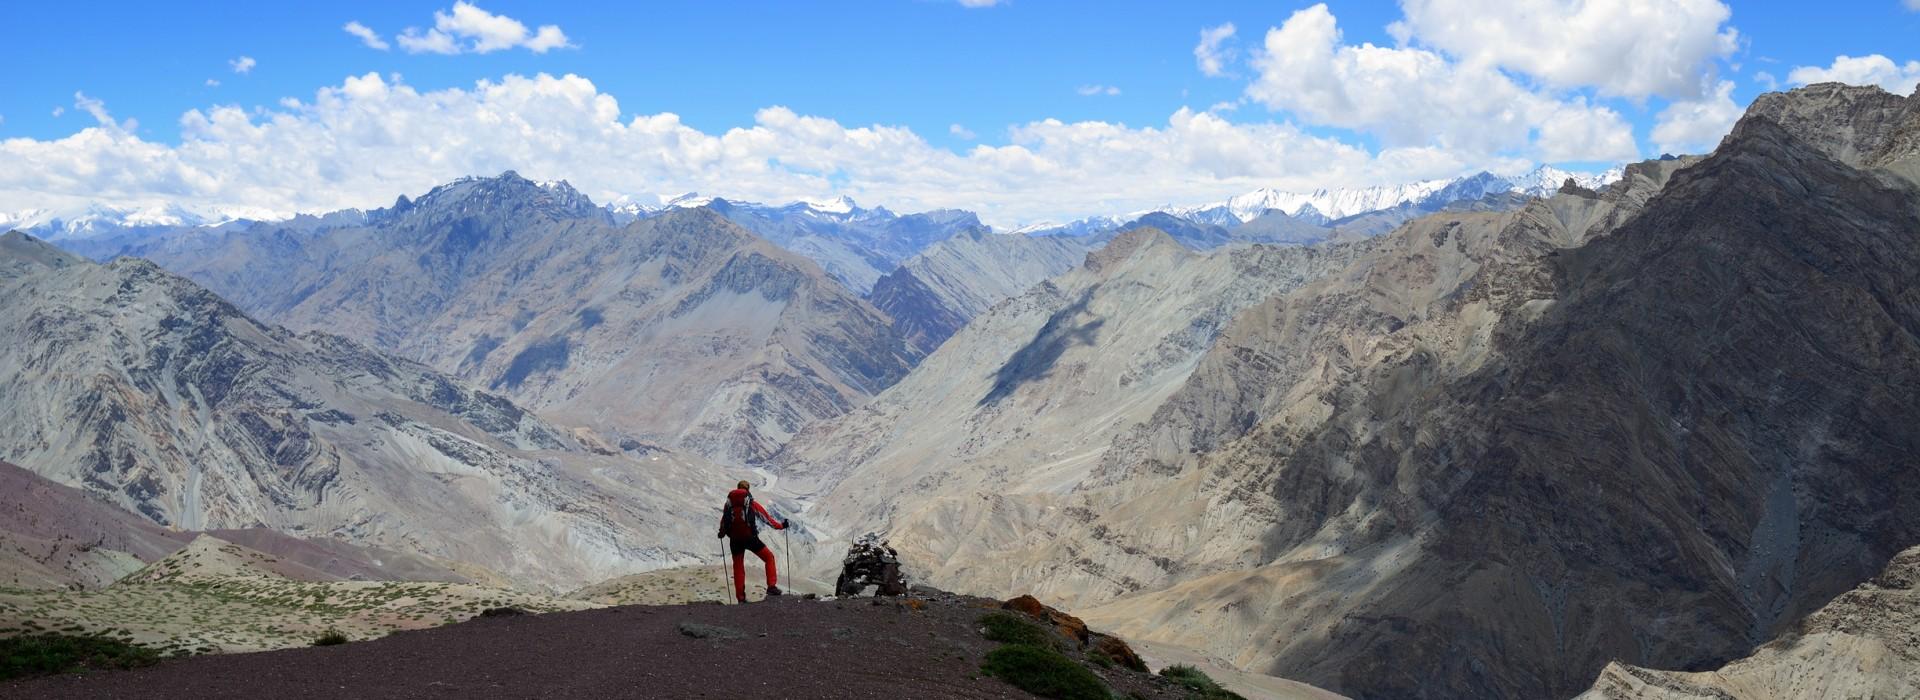 An abundance of scenery to enjoy in Markha Valley trek